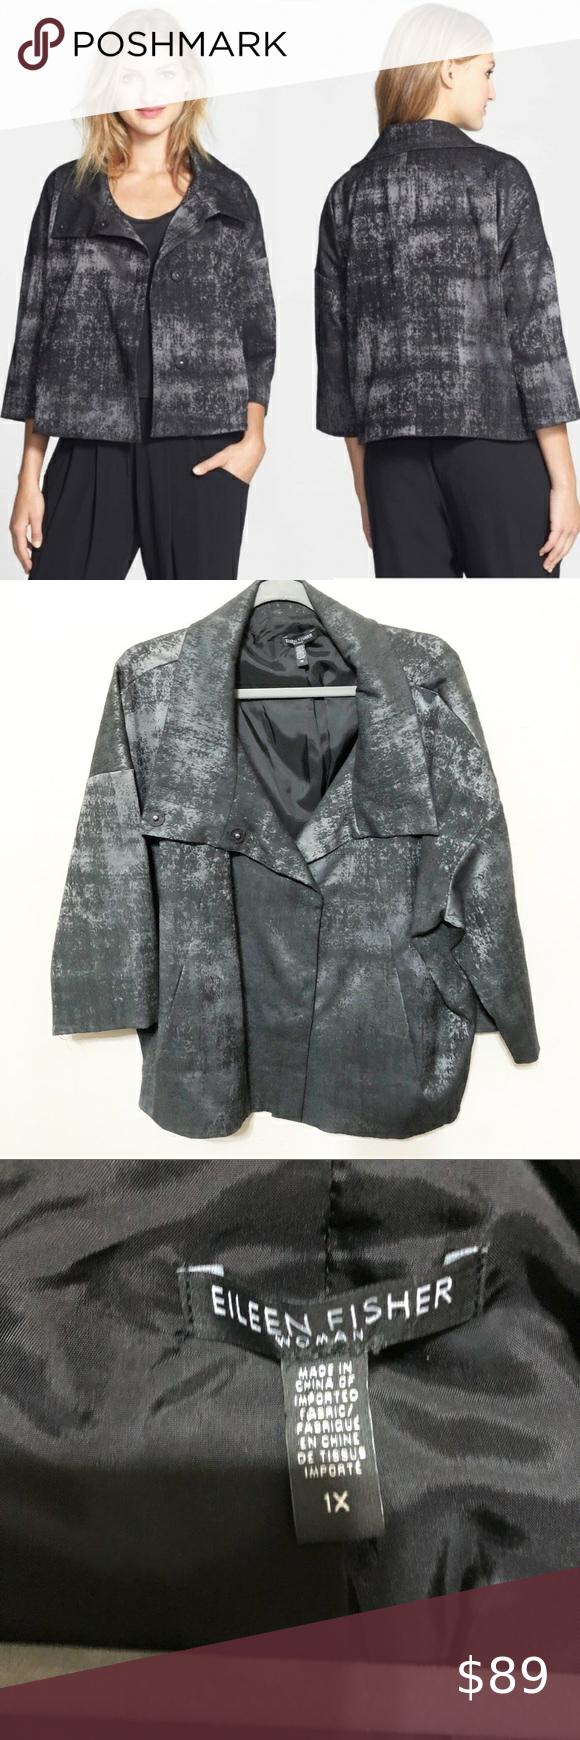 Eileen Fisher Grandeur Jacquard High Collar Jacket Eileen Fisher Women S Charcoal Grandeur Jacquard High Collar B High Collar Jacket High Collar Clothes Design [ 1740 x 580 Pixel ]